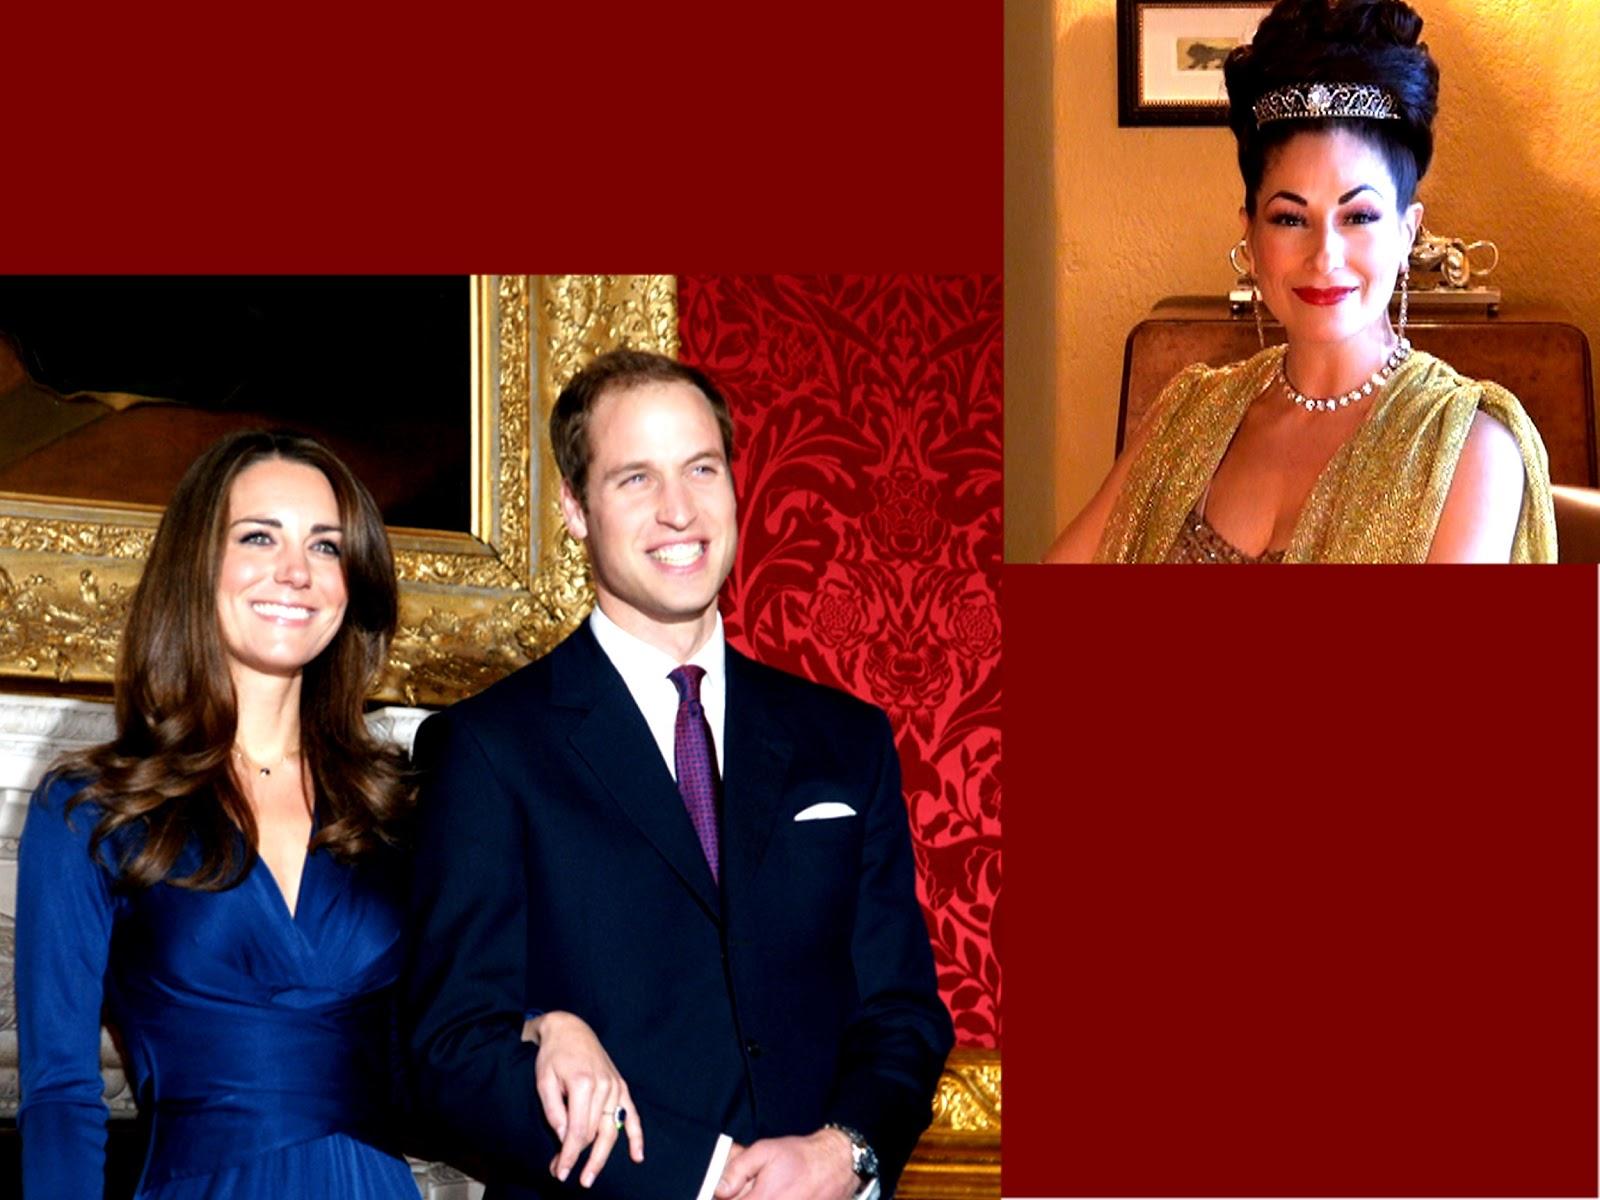 http://2.bp.blogspot.com/-ff1z_Vf9ZfE/TakCXxdQXWI/AAAAAAAAAXs/GsK5IFZdfb8/s1600/royal+princes.jpg